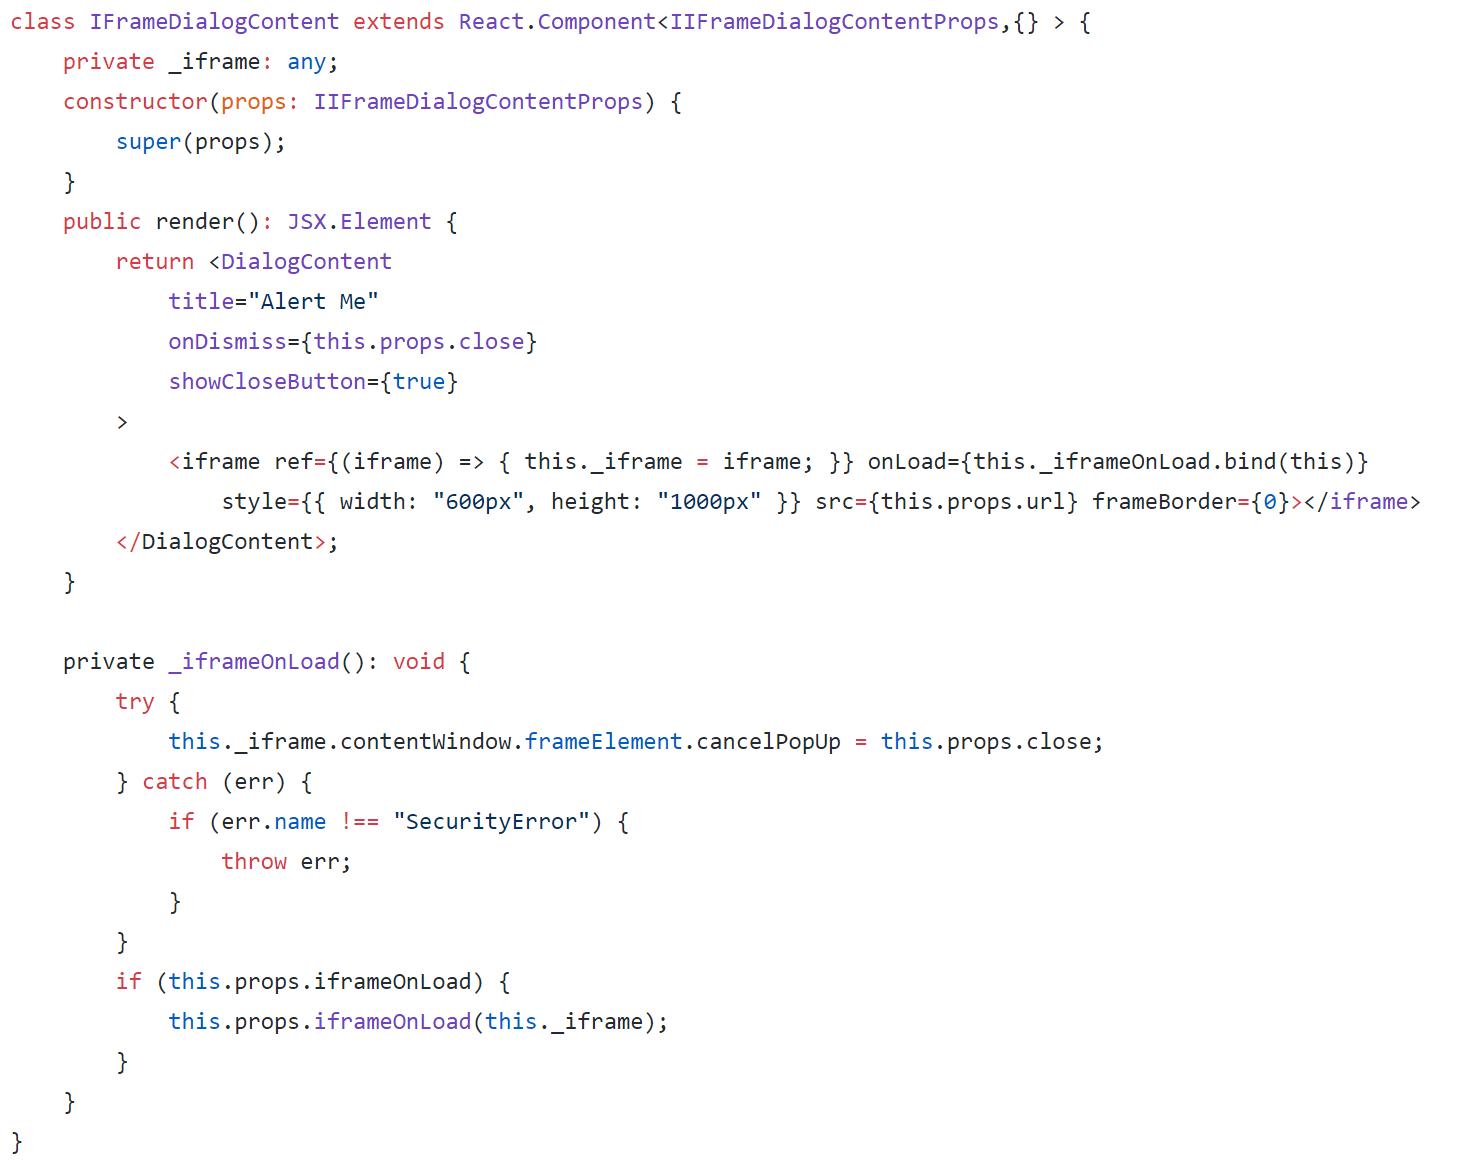 SPFx: Modal Dialog, show classic SharePoint forms | SharePointTweaks